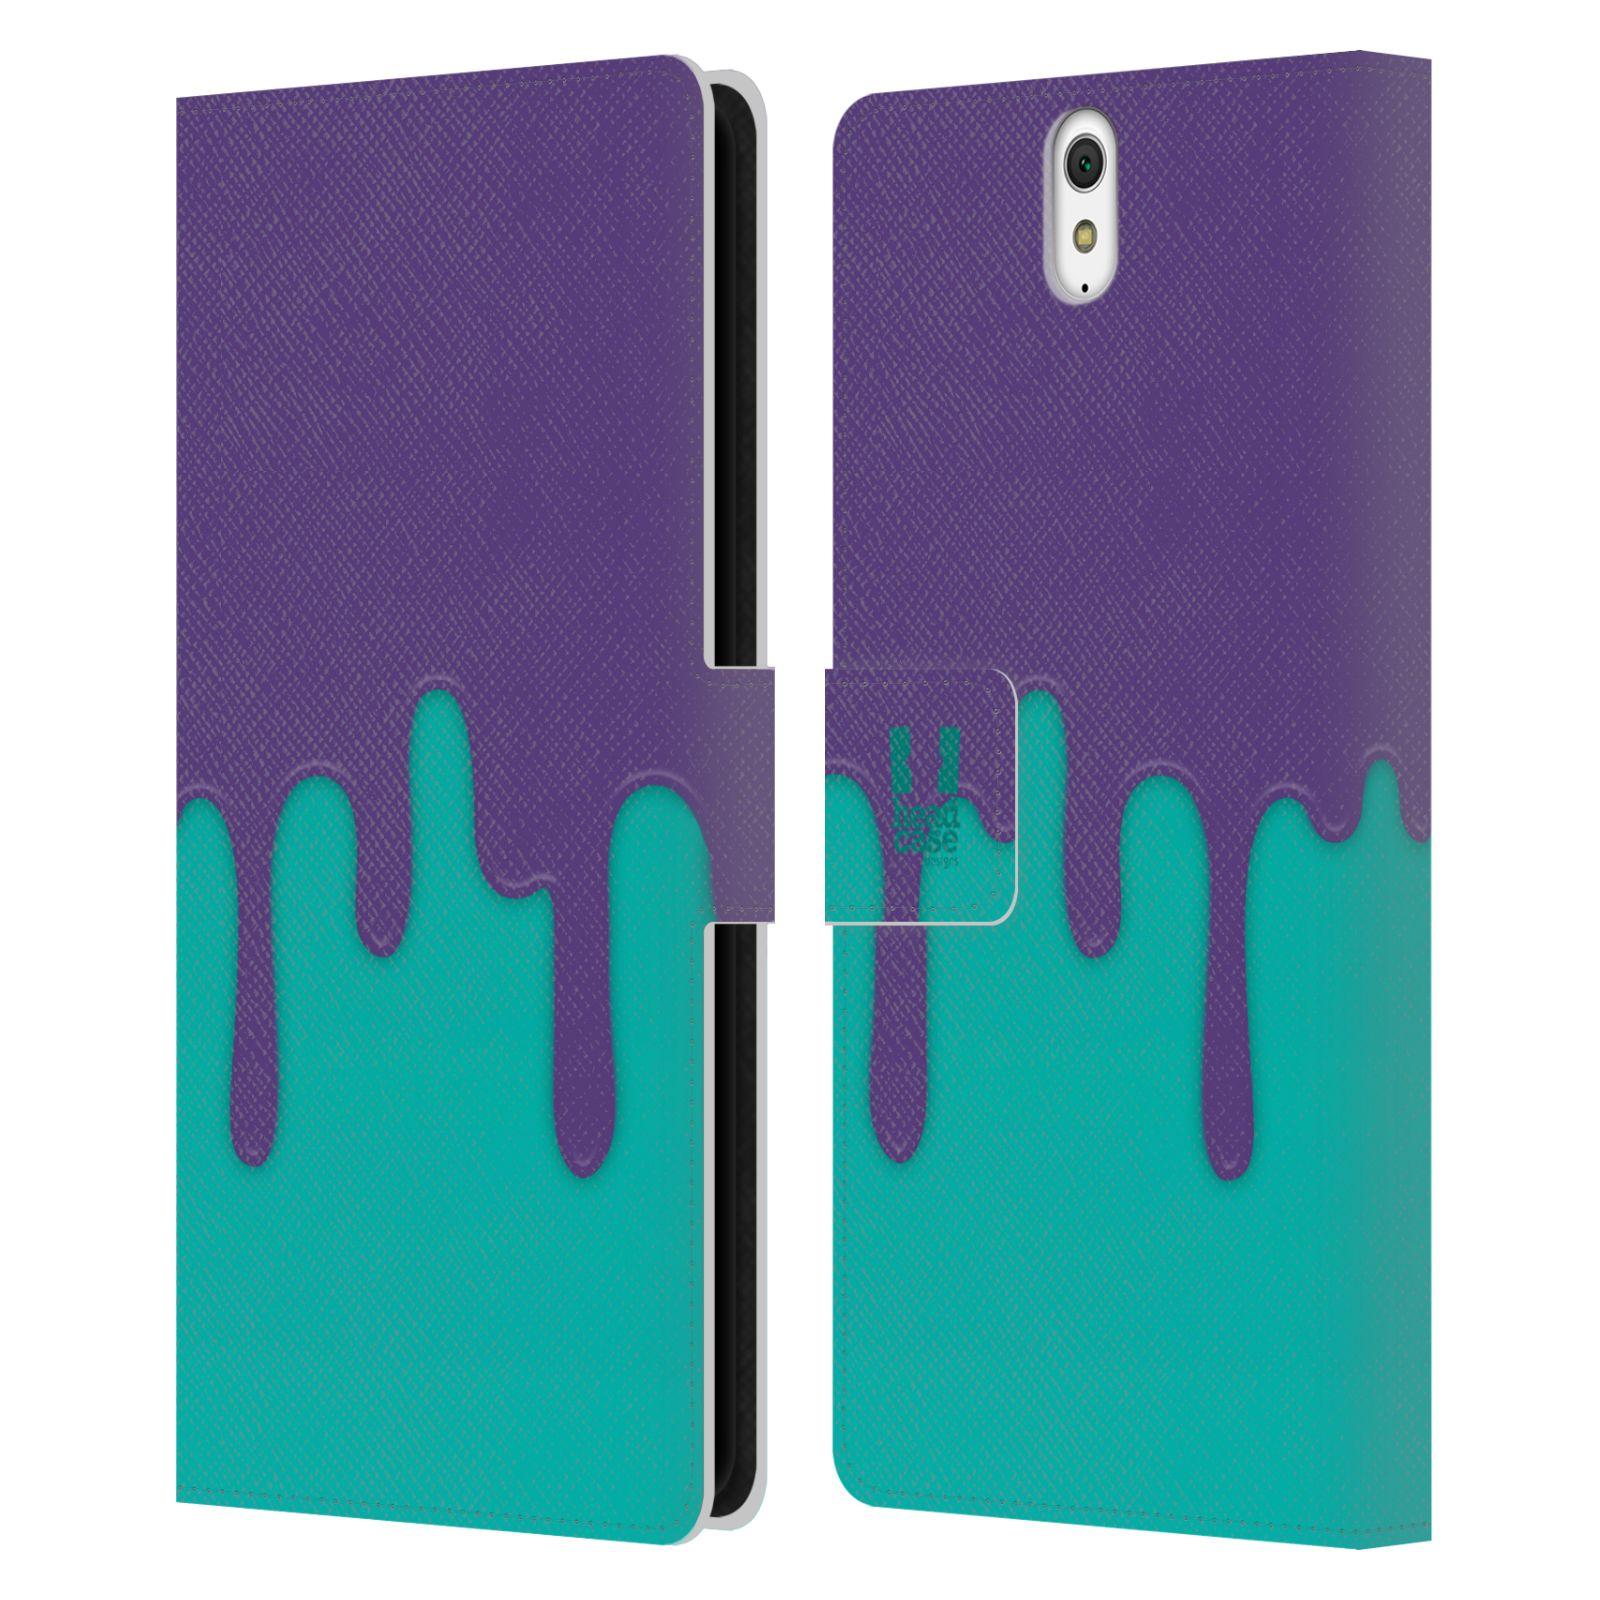 HEAD CASE Flipové pouzdro pro mobil SONY XPERIA C5 Ultra Rozlitá barva fialová a tyrkysová